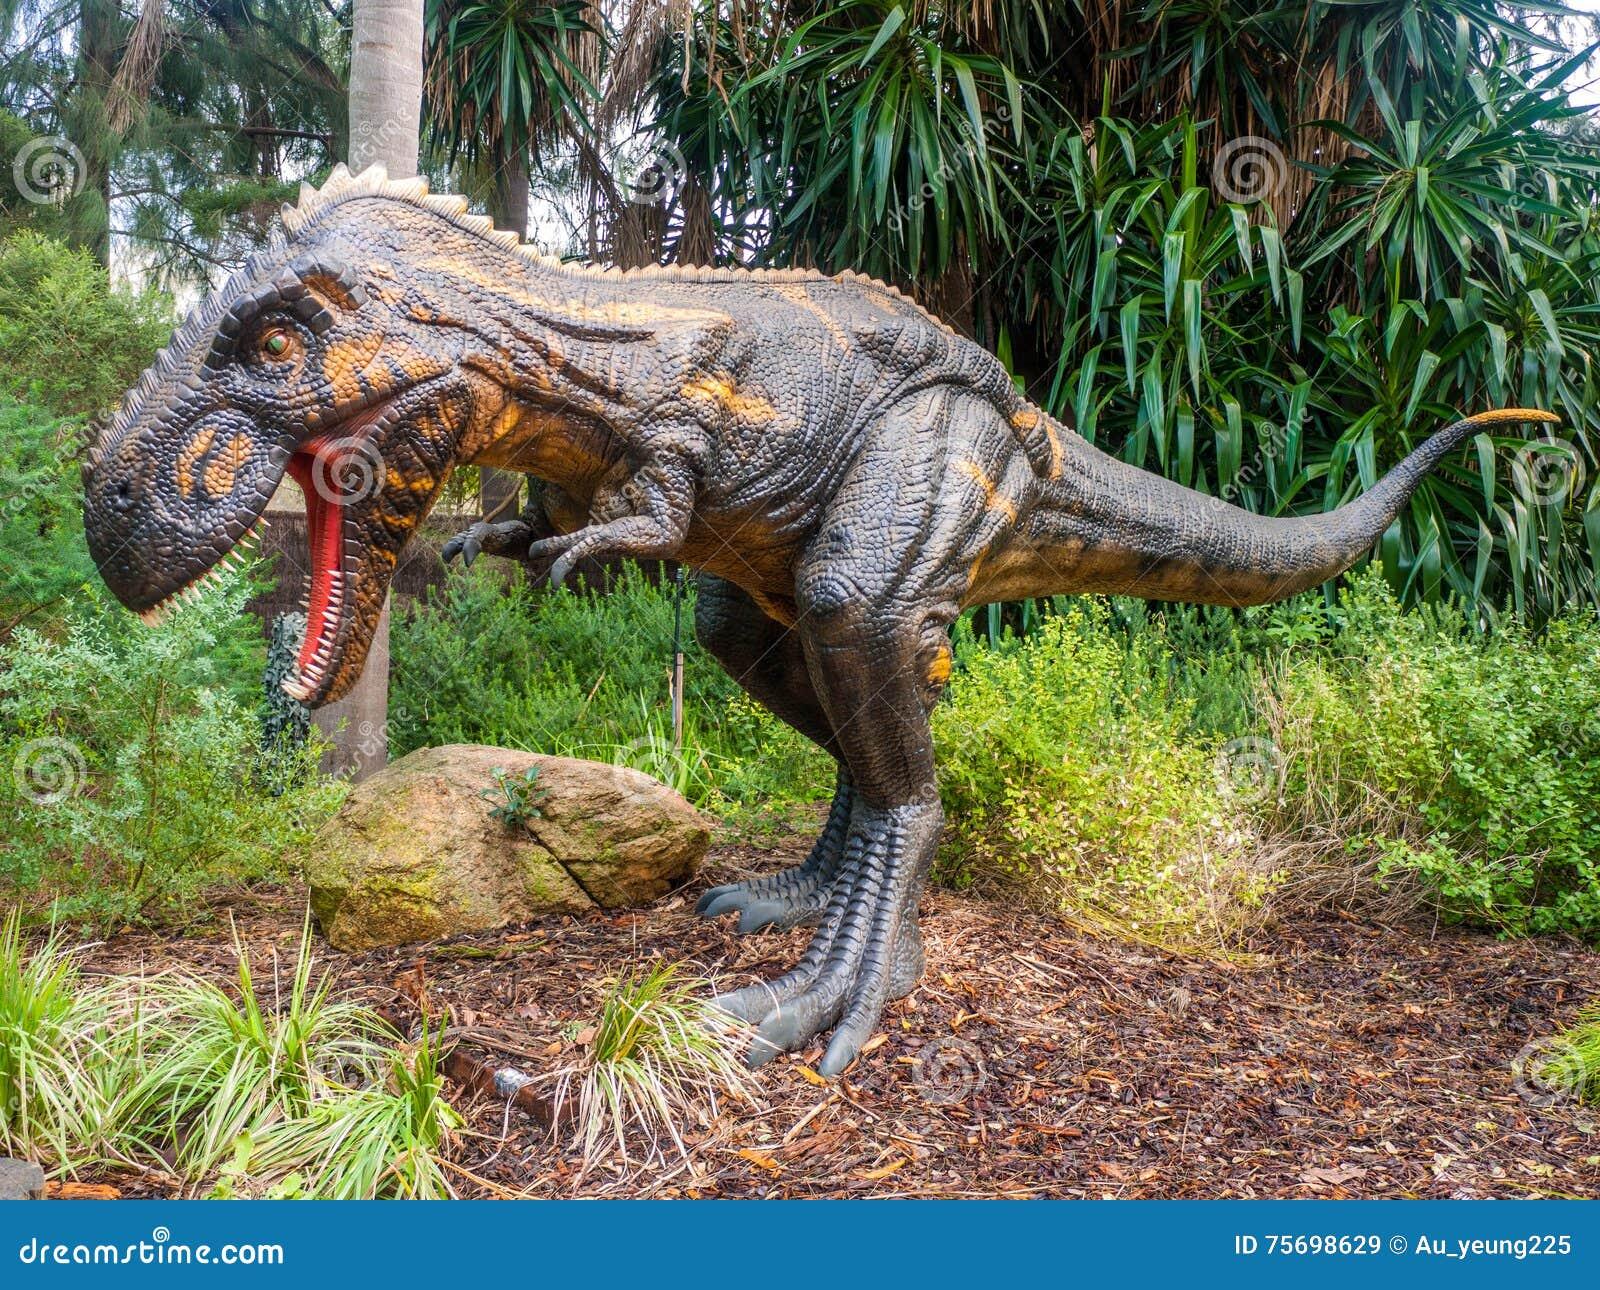 Exhibition Displays Perth : Roaring nanotyrannus display model in perth zoo editorial stock